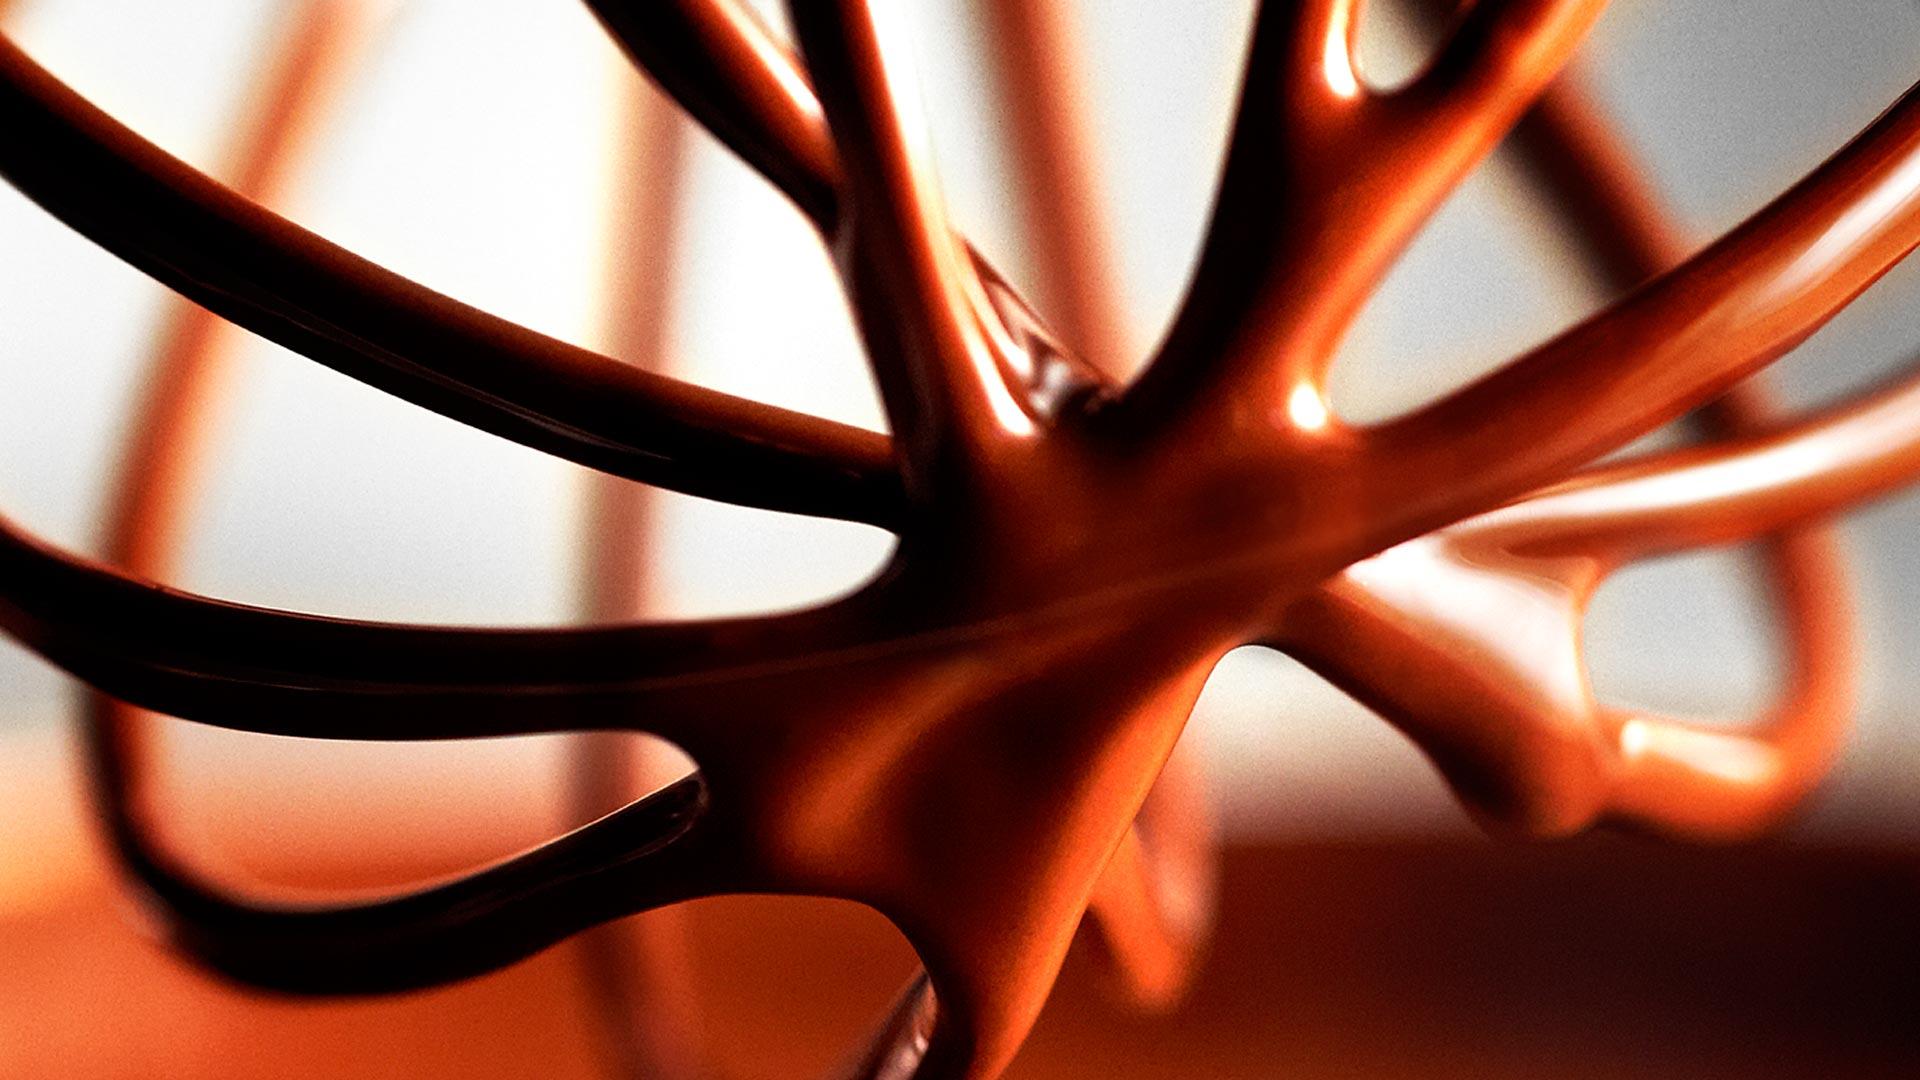 fo_f4p3d-xocolata-01